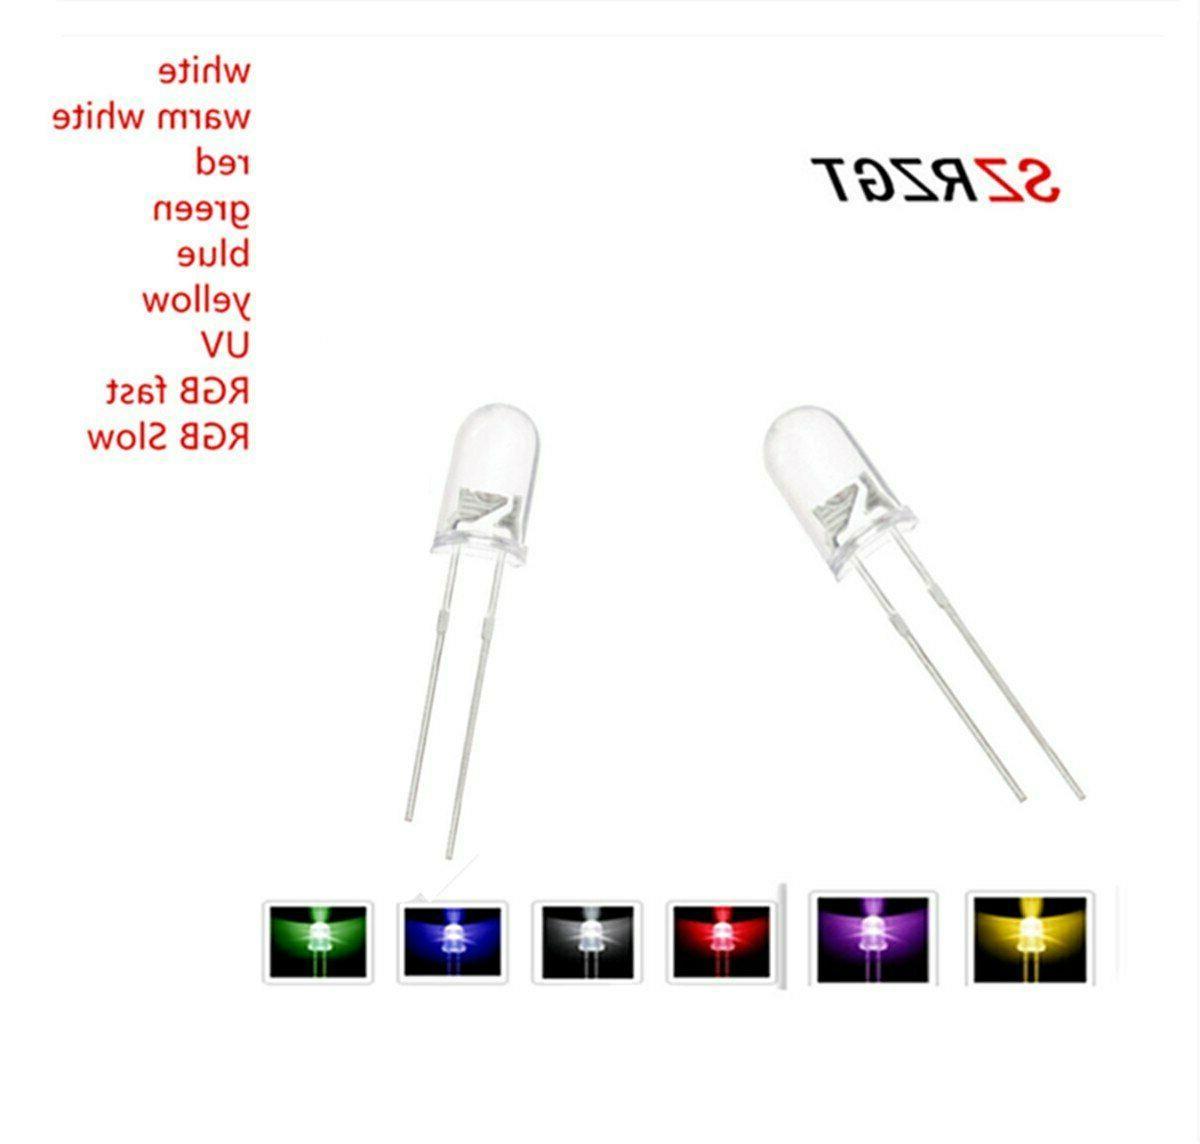 1000pcs 5mm led white/blue/red/yellow/green/pink bulbs emitting